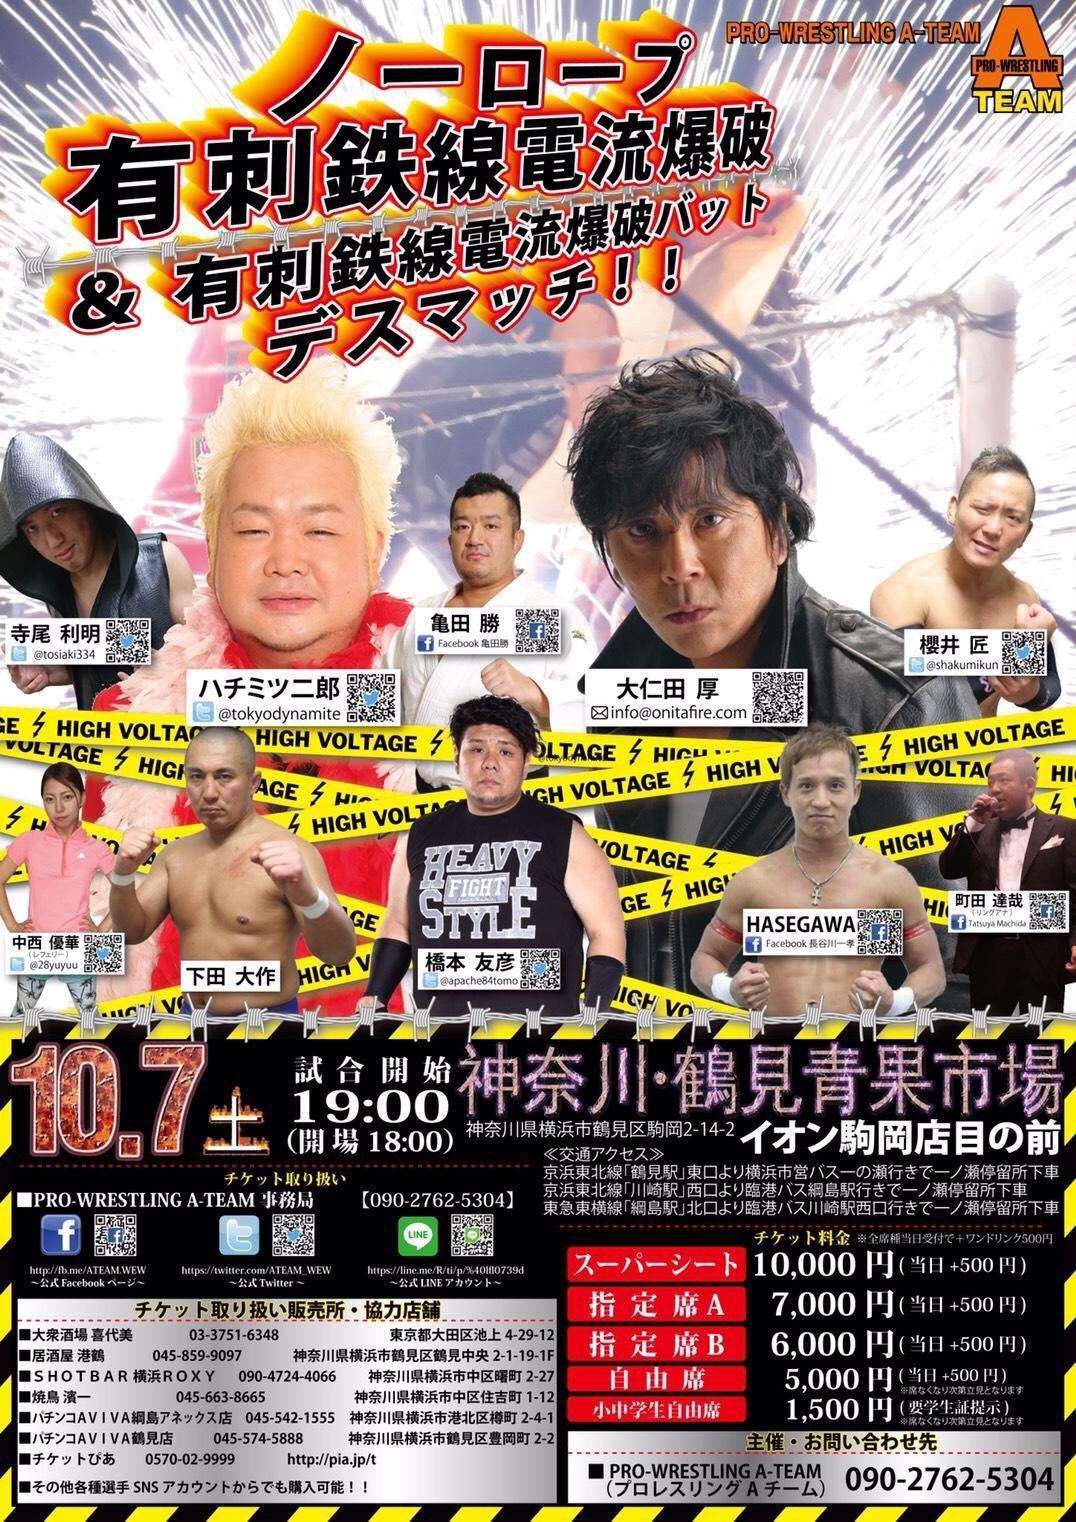 http://news.yoshimoto.co.jp/20171006135454-96bdf9146021efd698e3cee05417322278a6d135.jpg